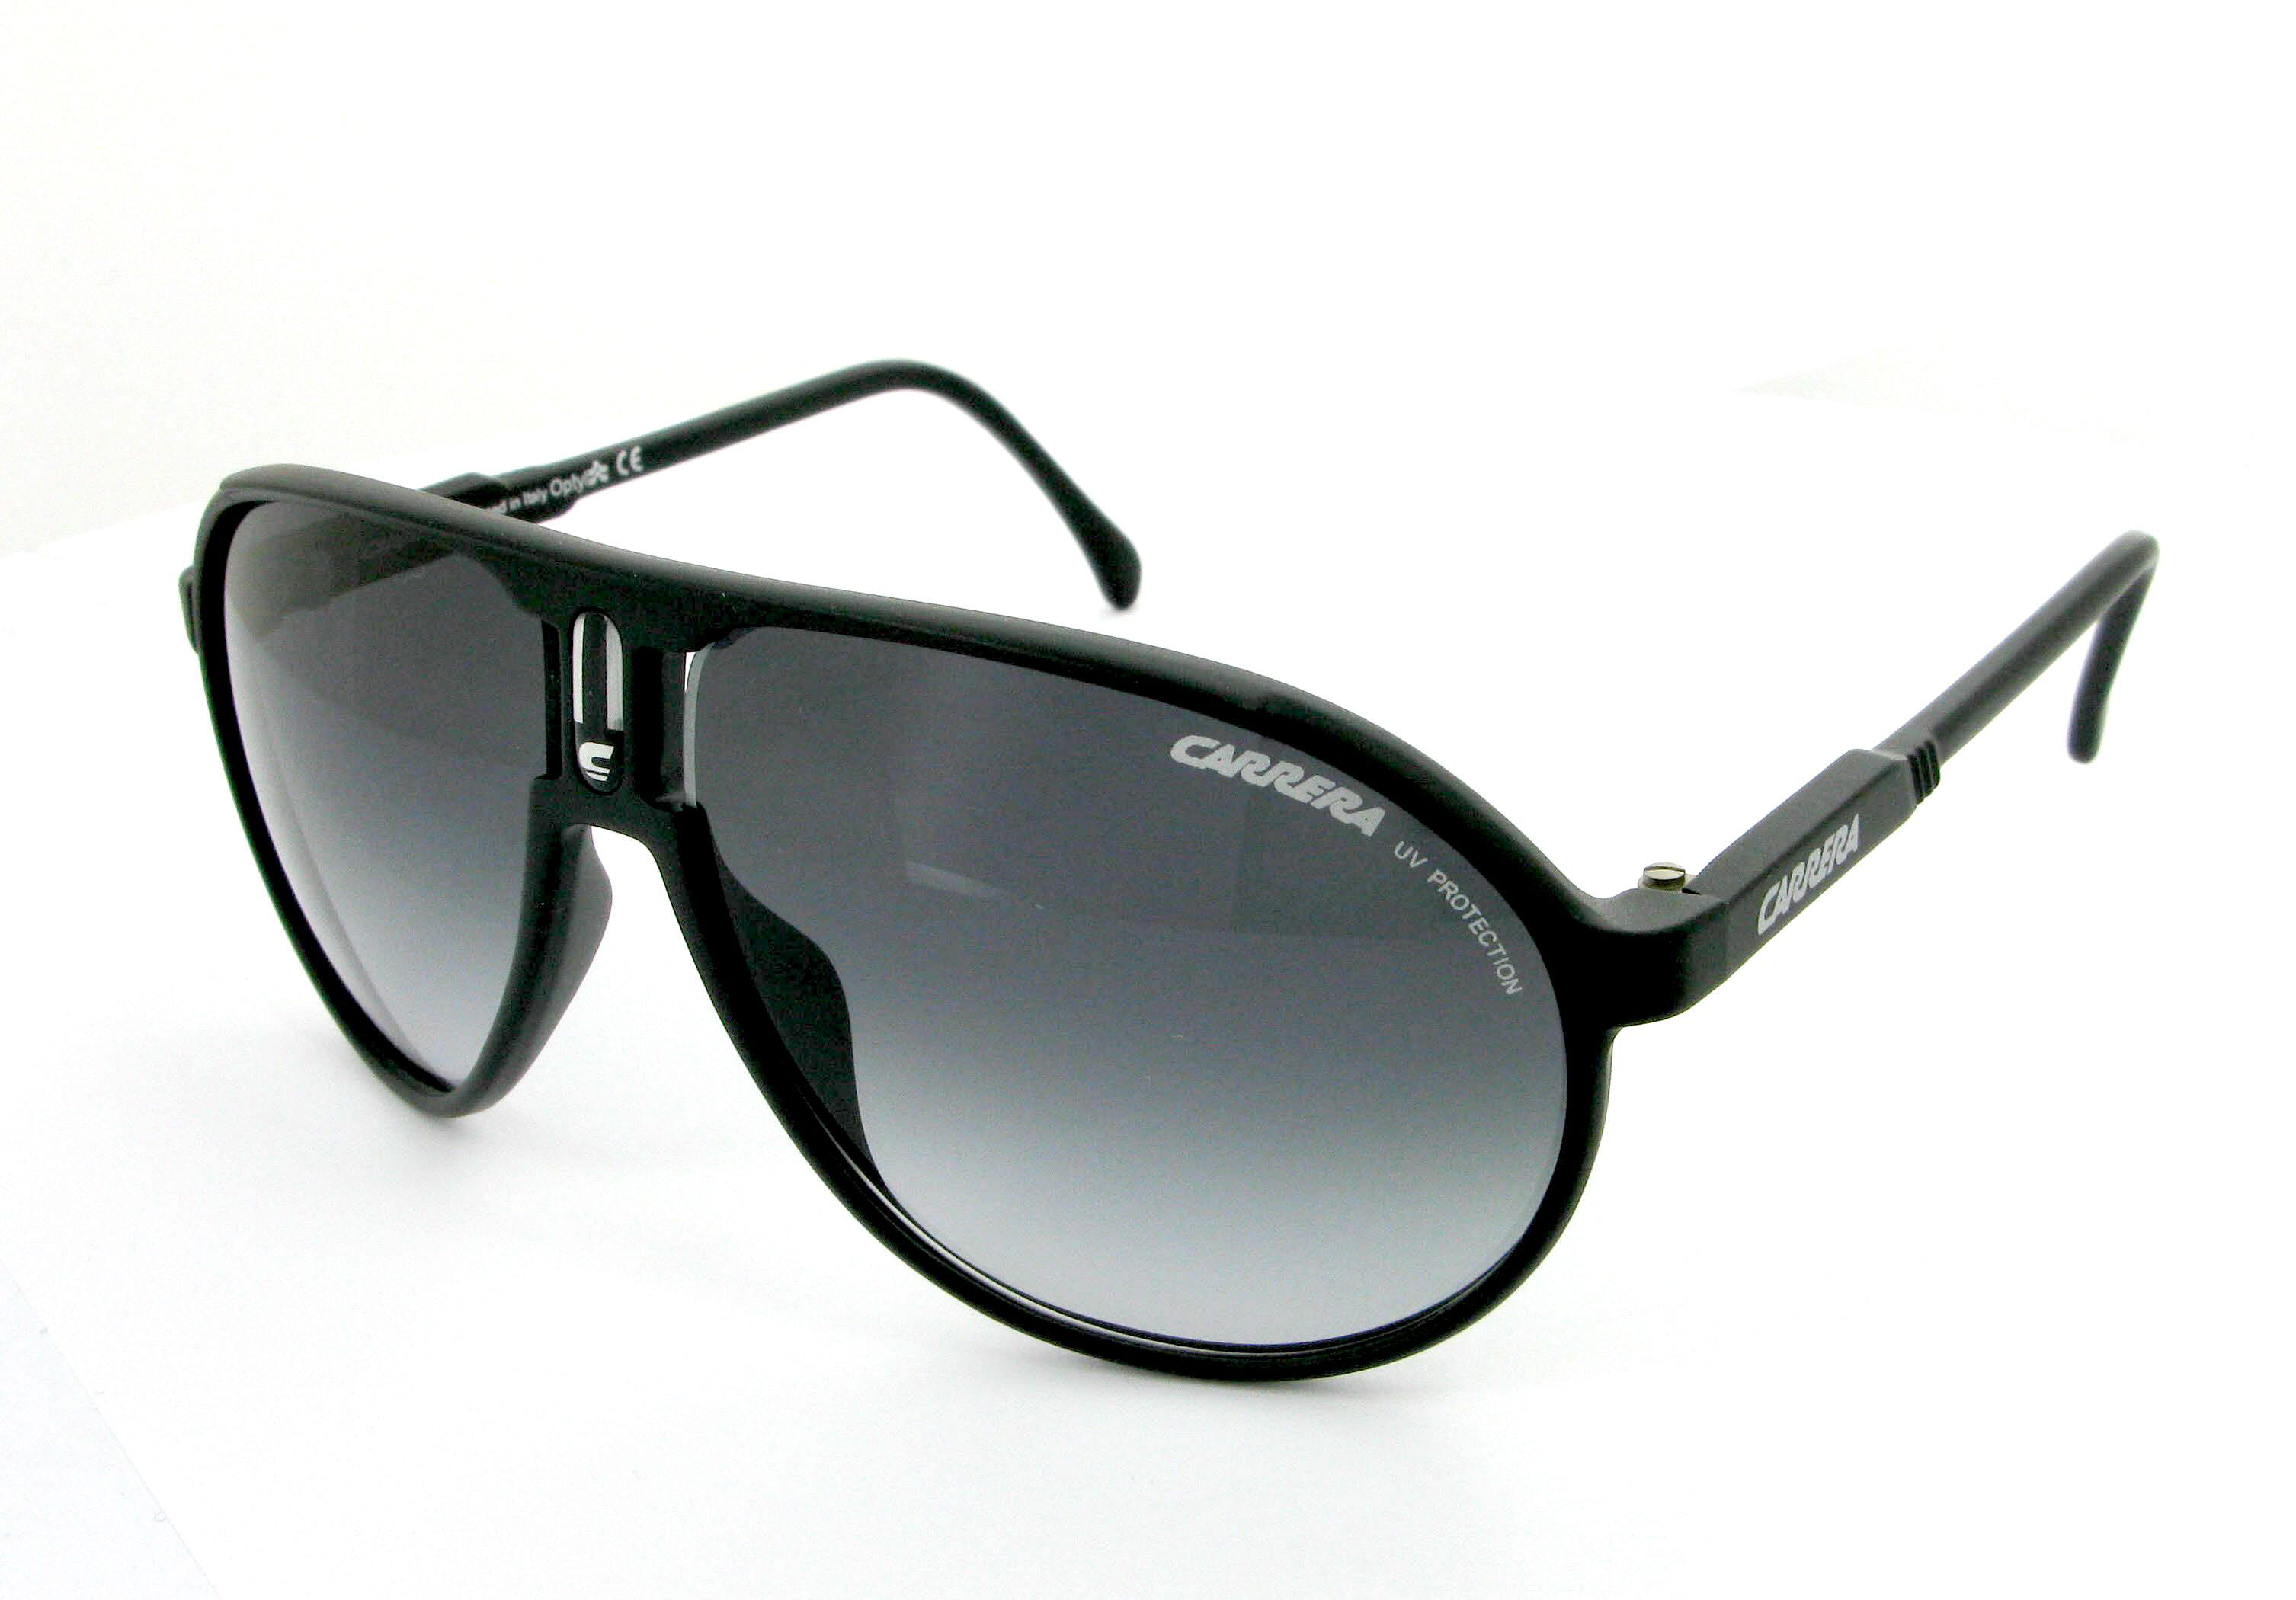 airmax lunettes carrera homme pas cher